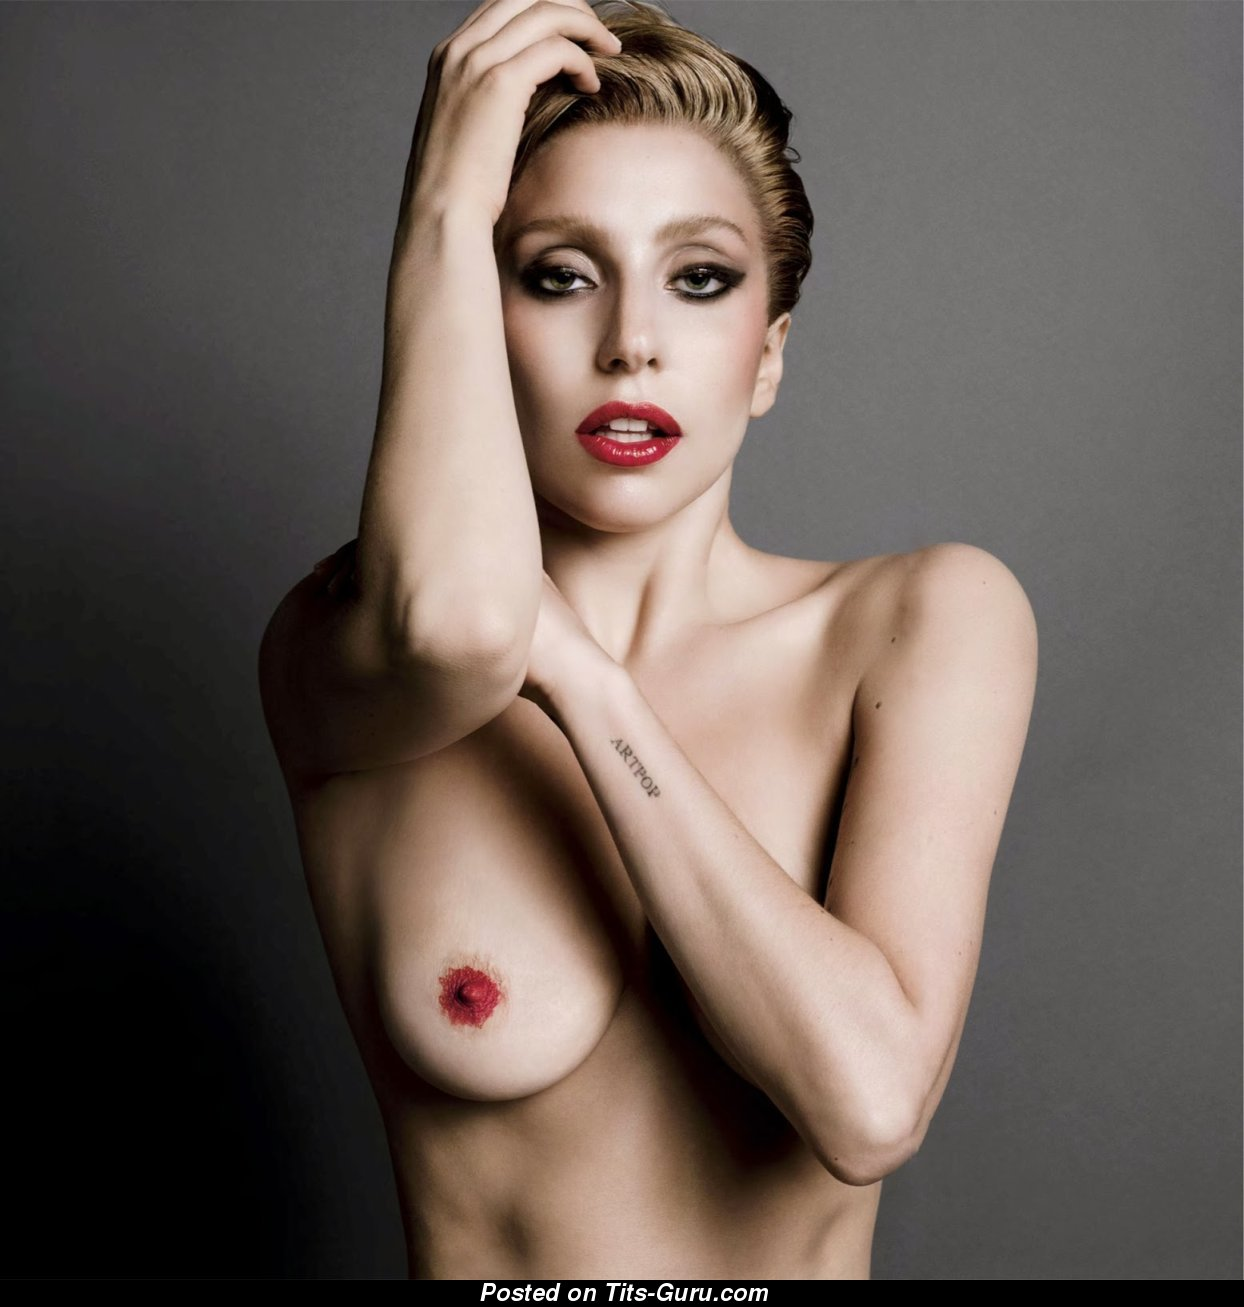 Gaga fur nude, hot italian girls naked best galleries